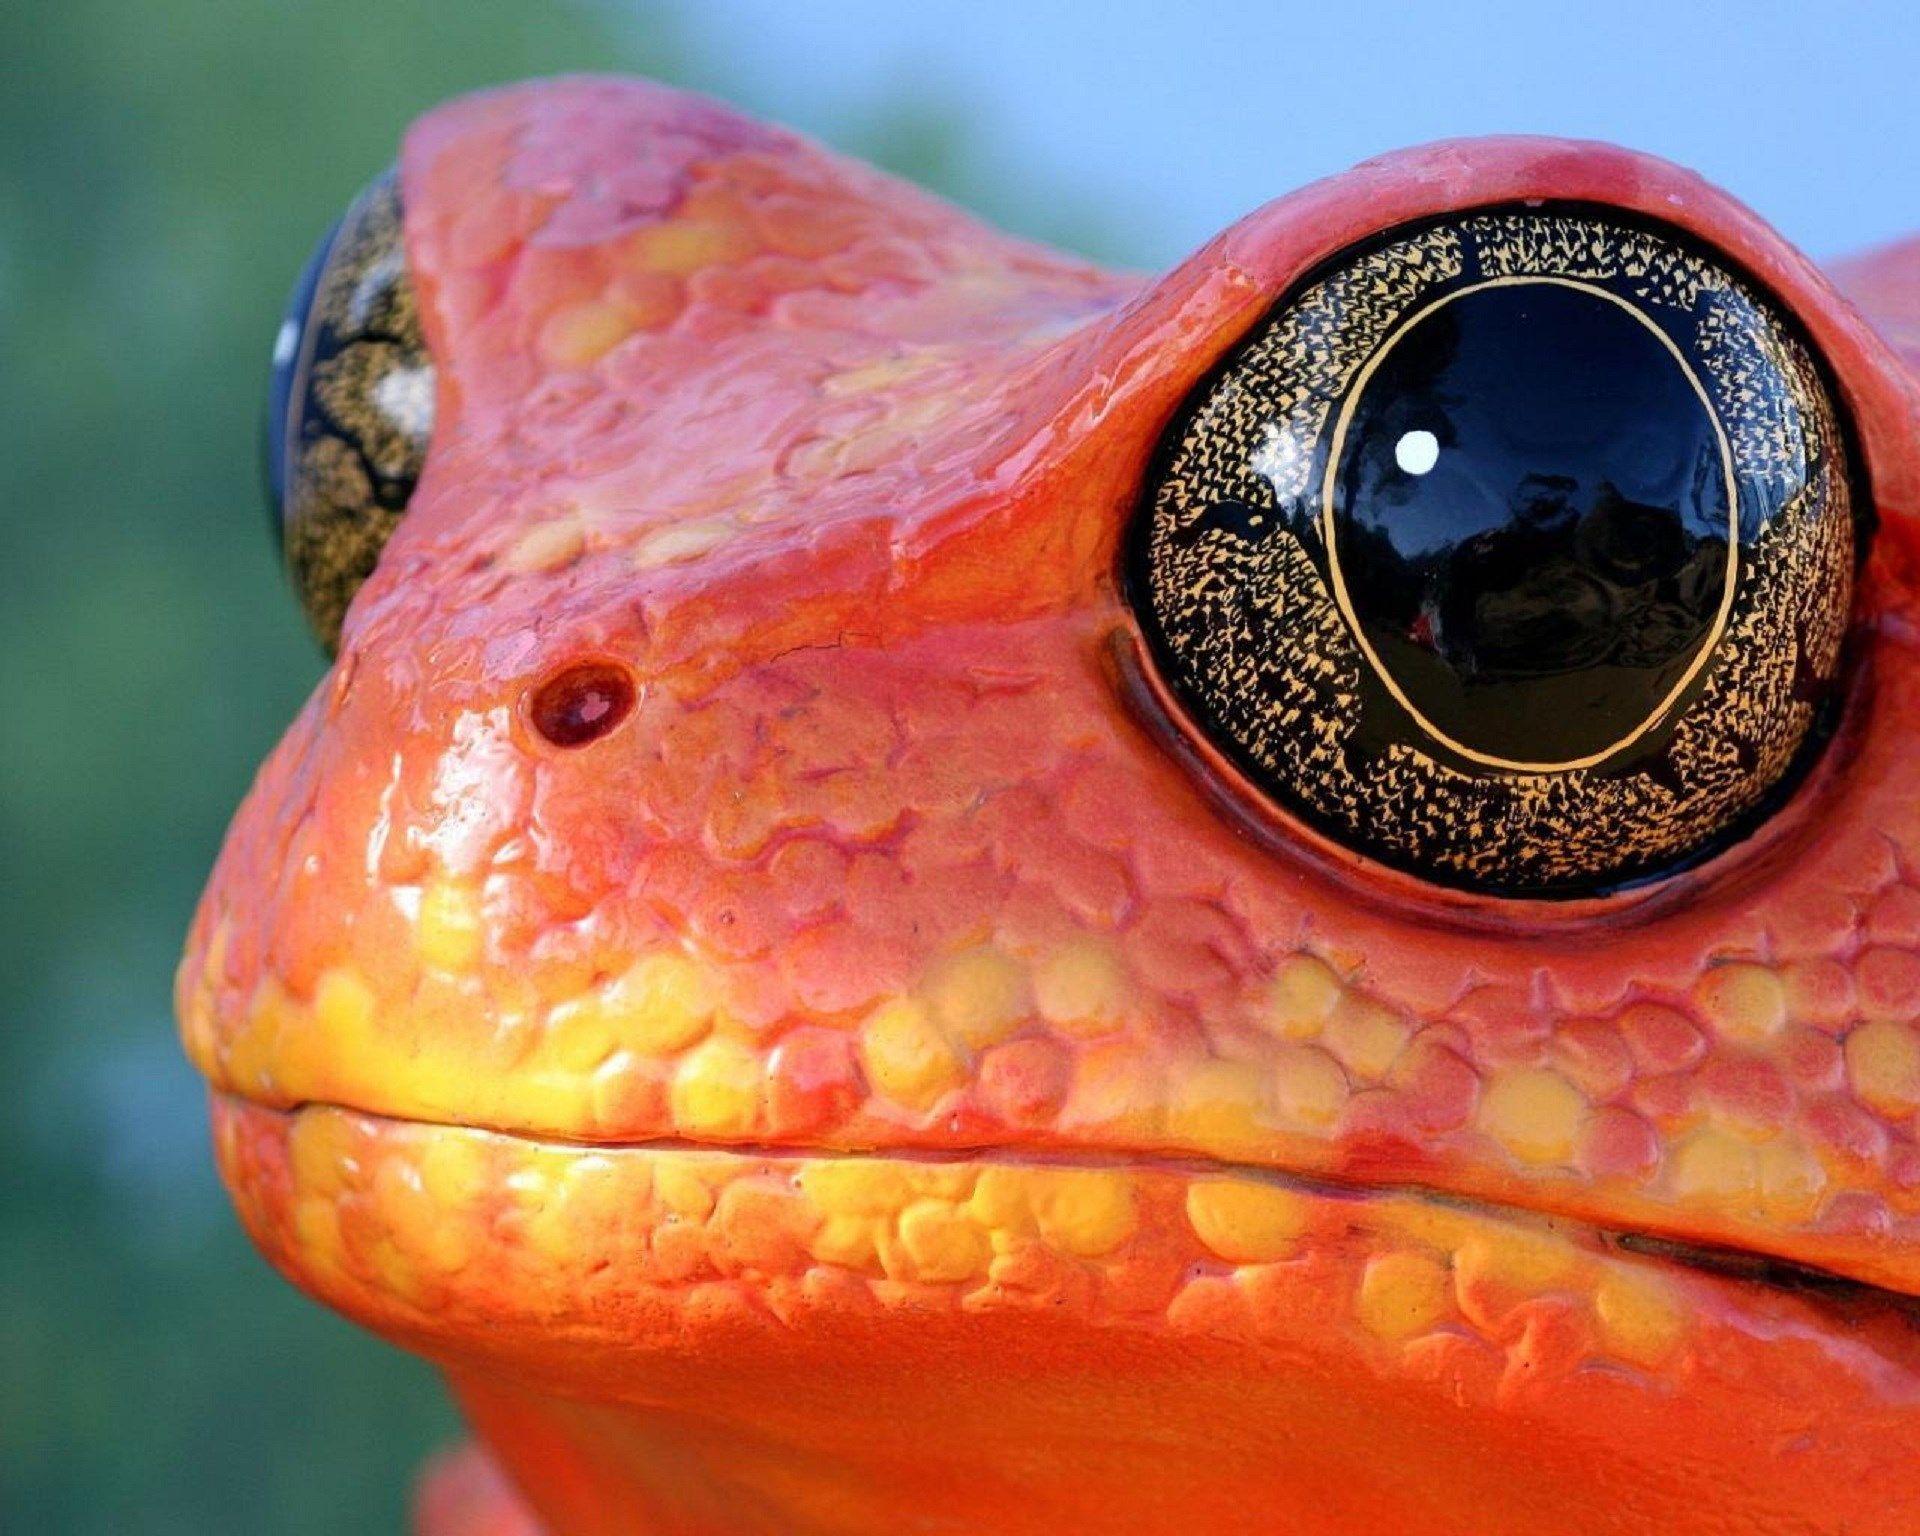 Free Walter - frog backround widescreen retina imac - 1920x1536 px